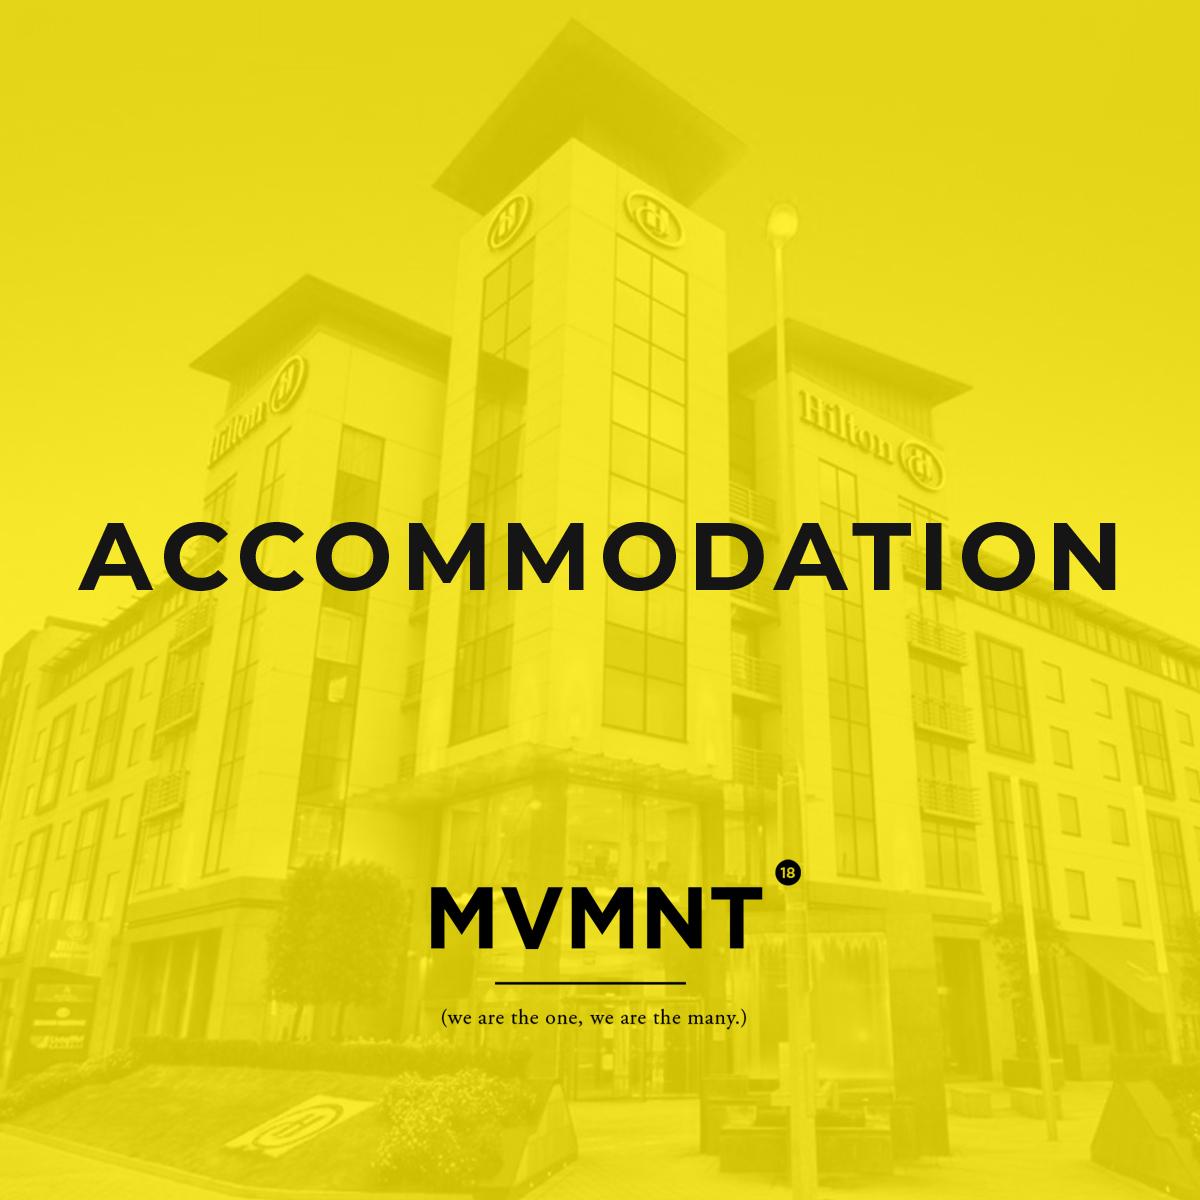 MVMNT_accommodation SM.jpg